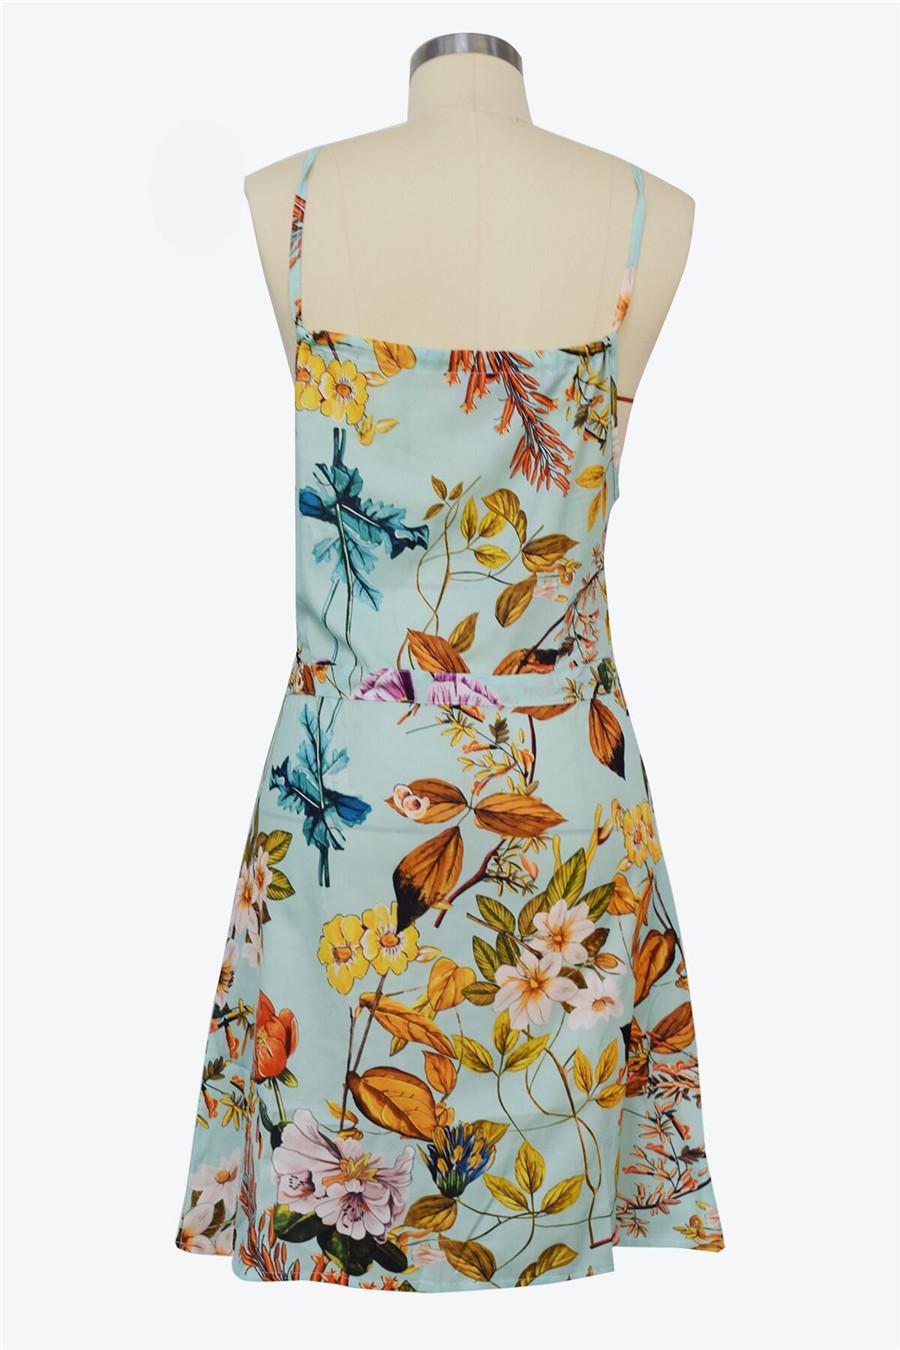 Gladiolus Chiffon Women Summer Dress Spaghetti Strap Floral Print Pocket Sexy Bohemian Beach Dress 2019 Short Ladies Dresses (32)